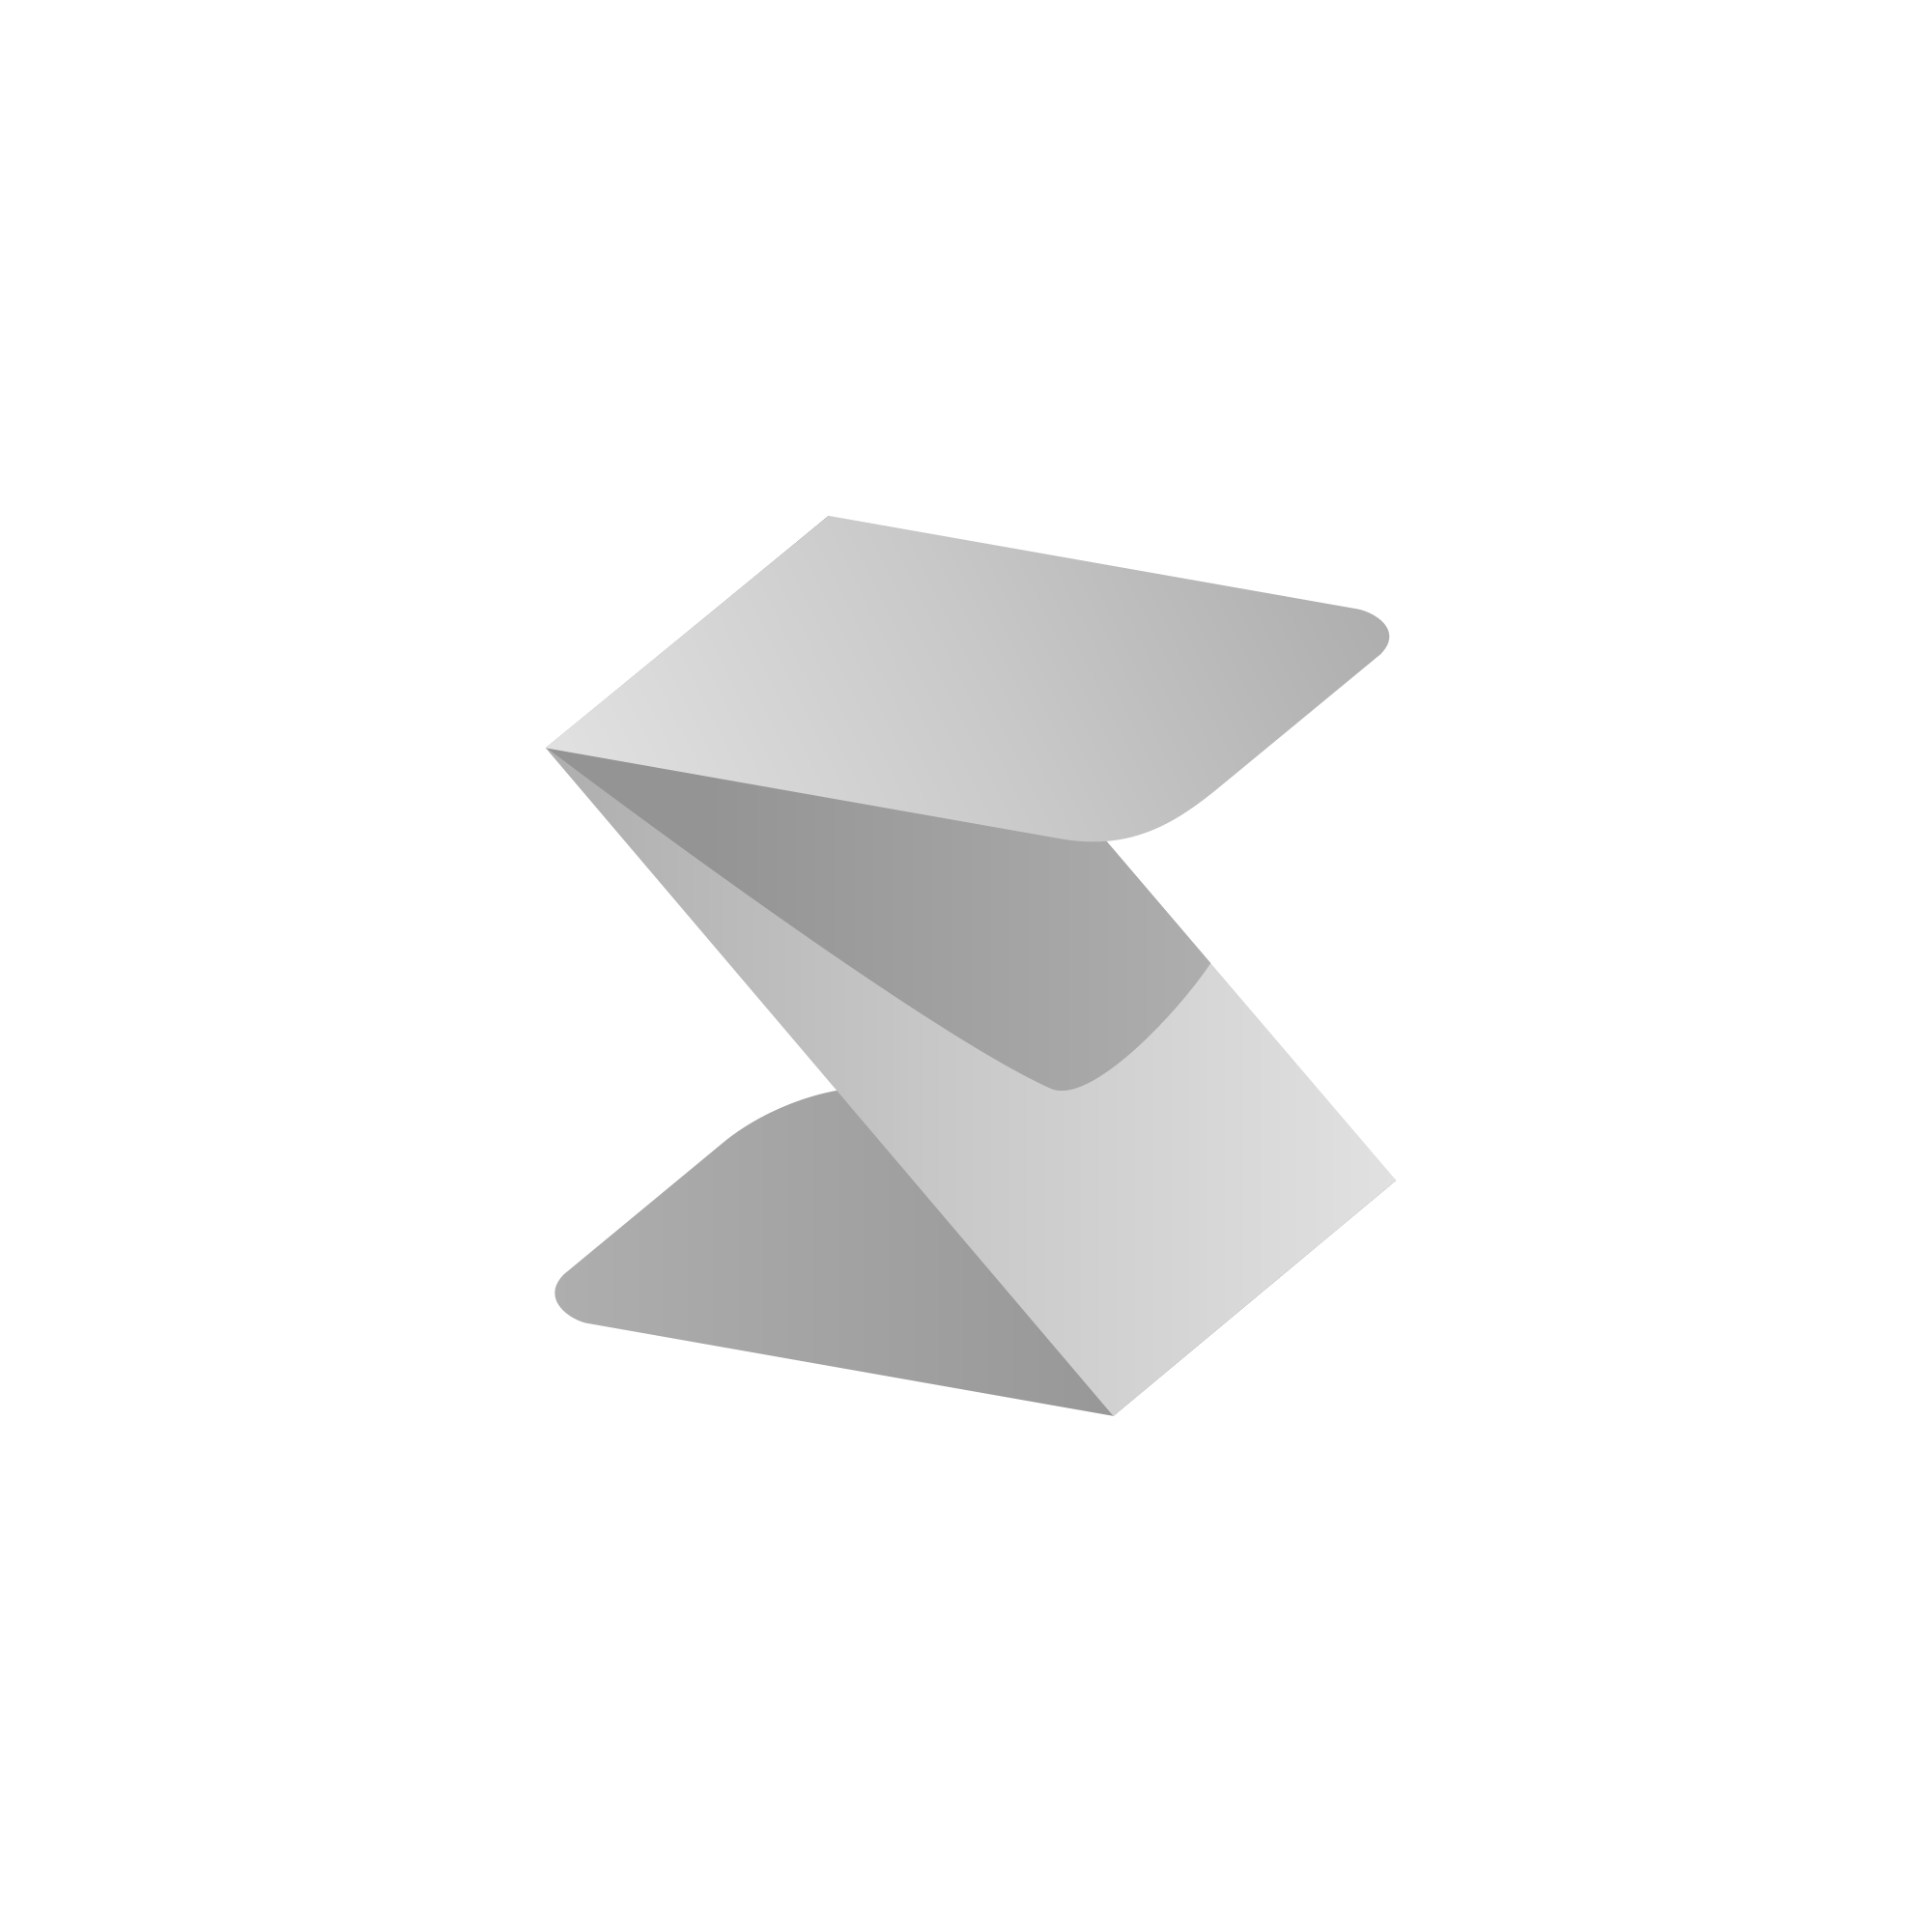 Structuralia-Simbolo-1